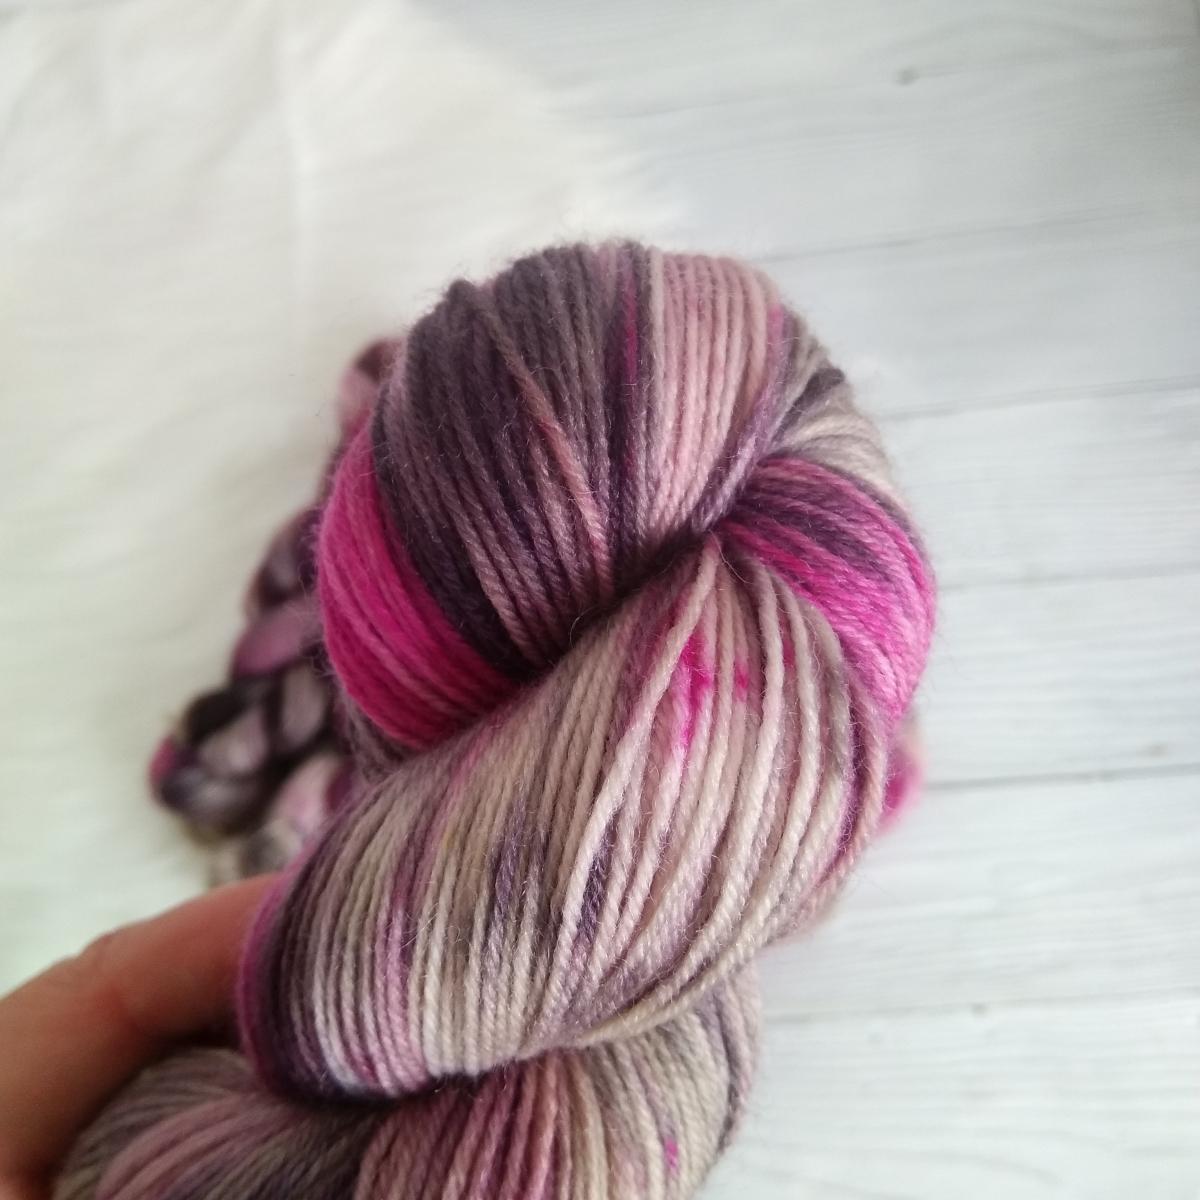 woodico.pro hand dyed yarn 037 5 1200x1200 - Hand dyed yarn / 037